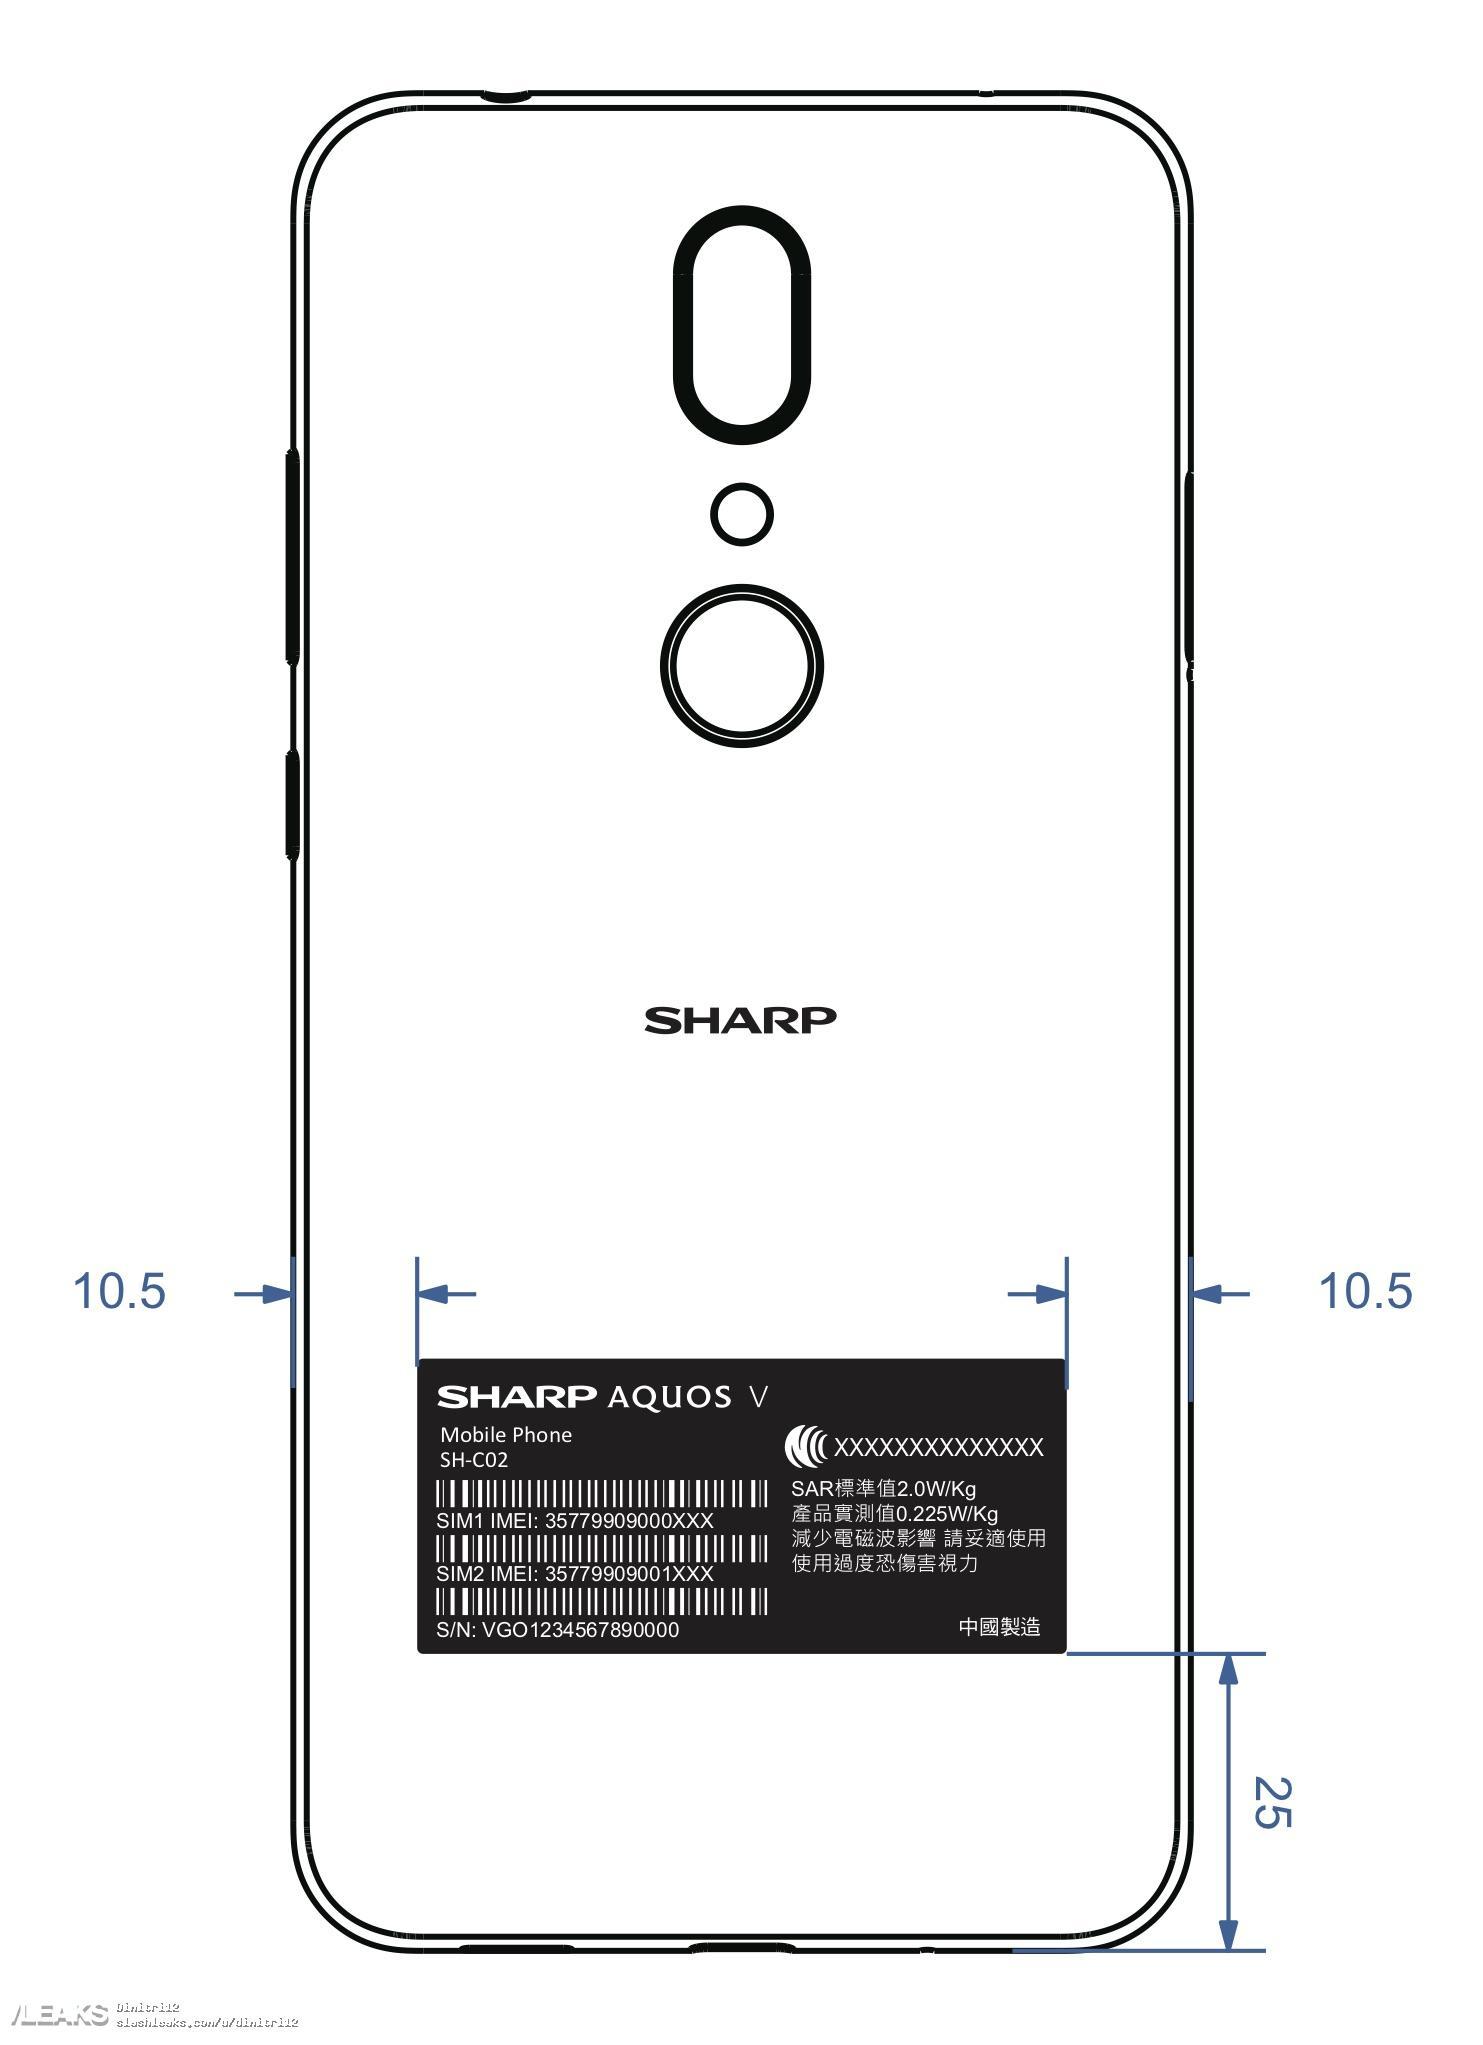 img Sharp Aquos V (SH-C02) schematics leaked by FCC